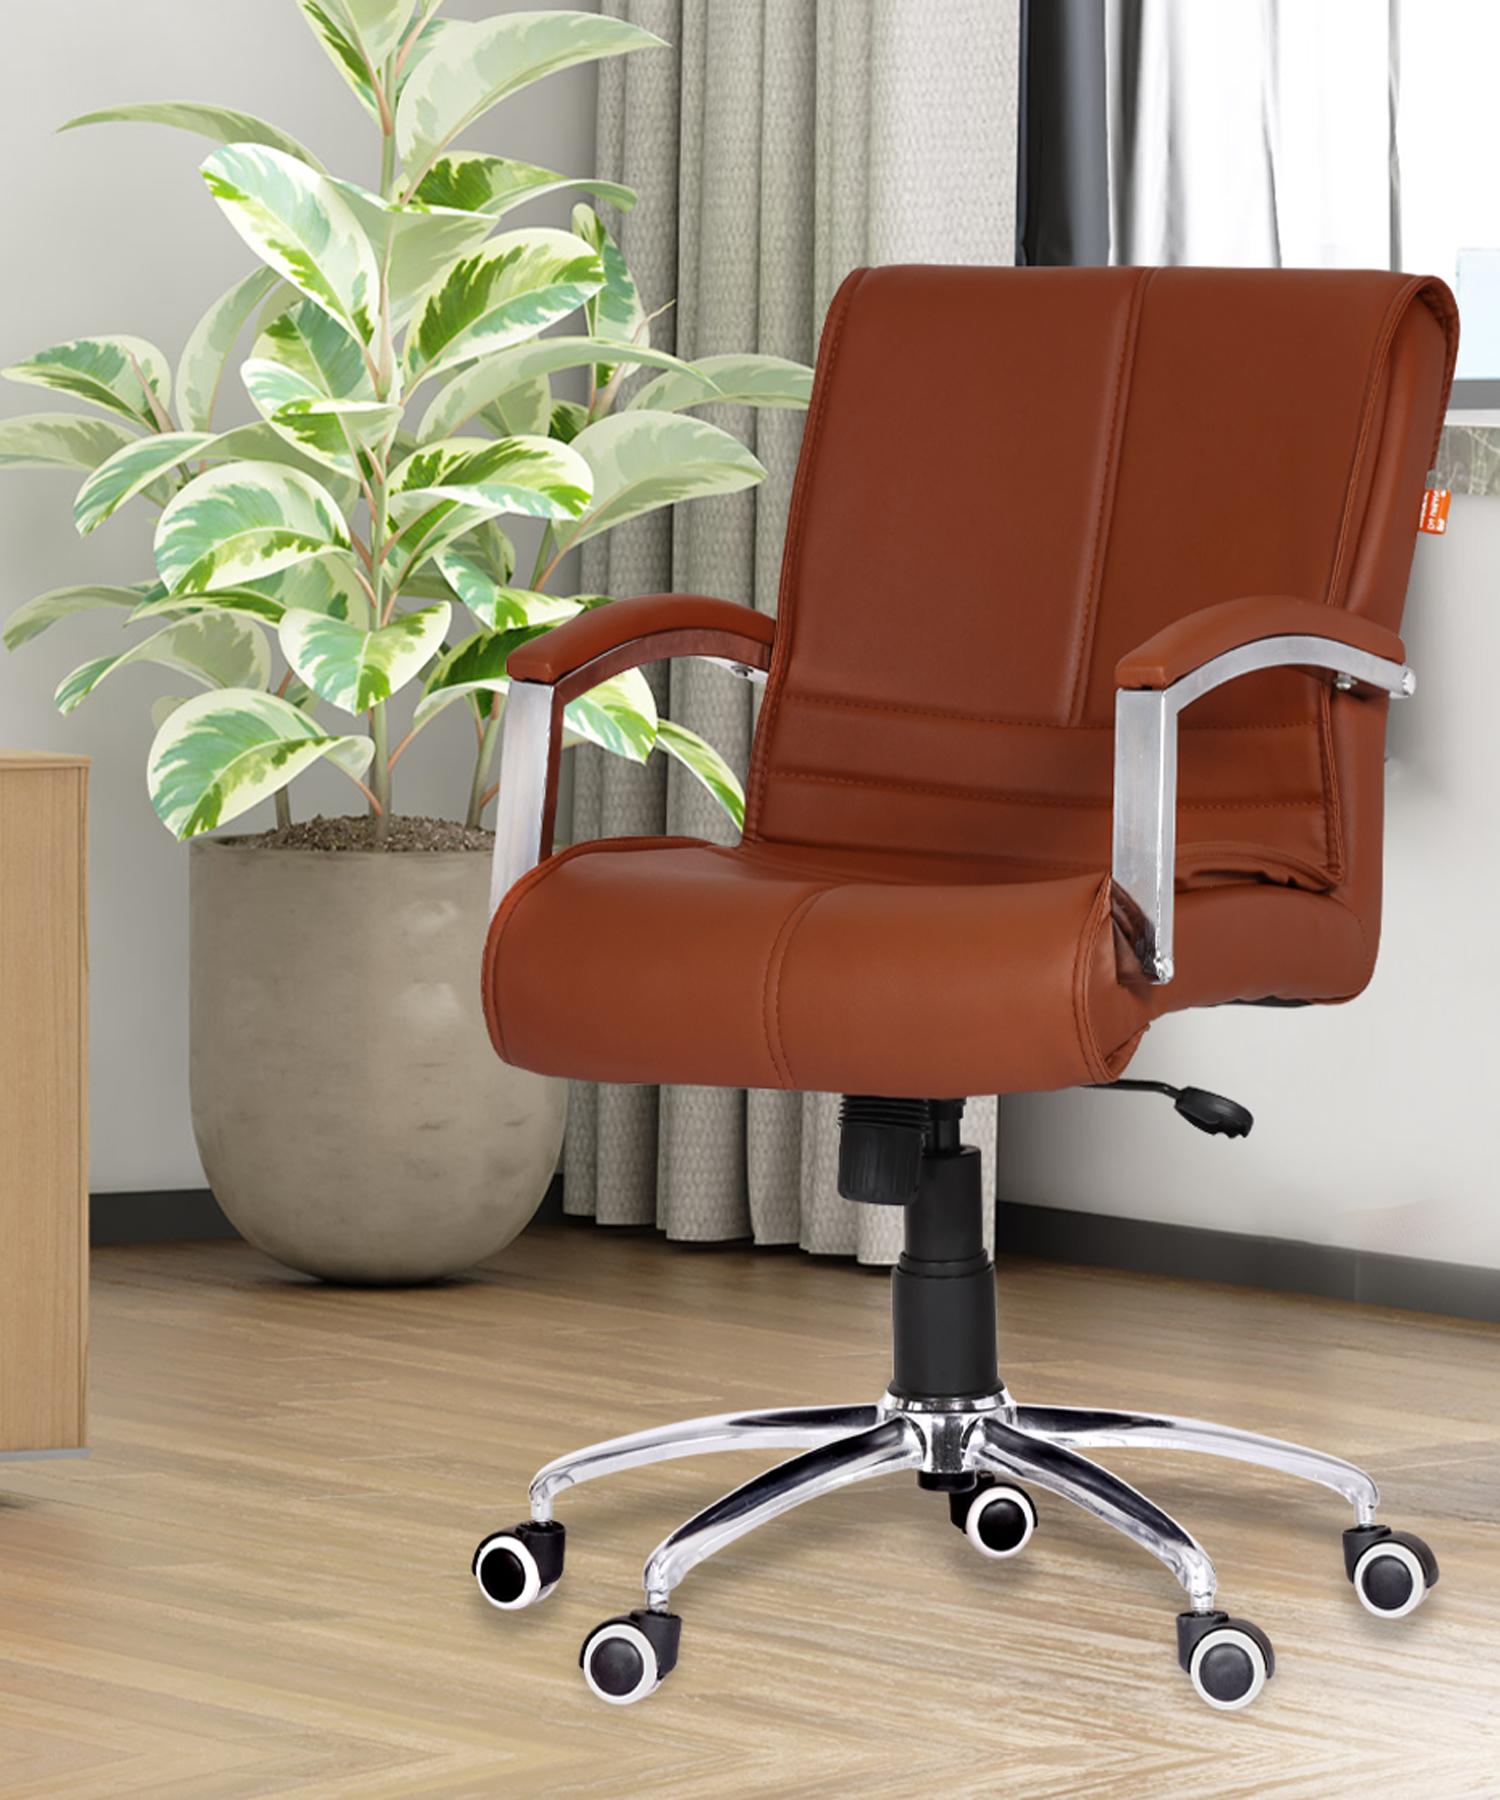 Da URBAN® Malden Mid-Back Revolving Chair (Tan)